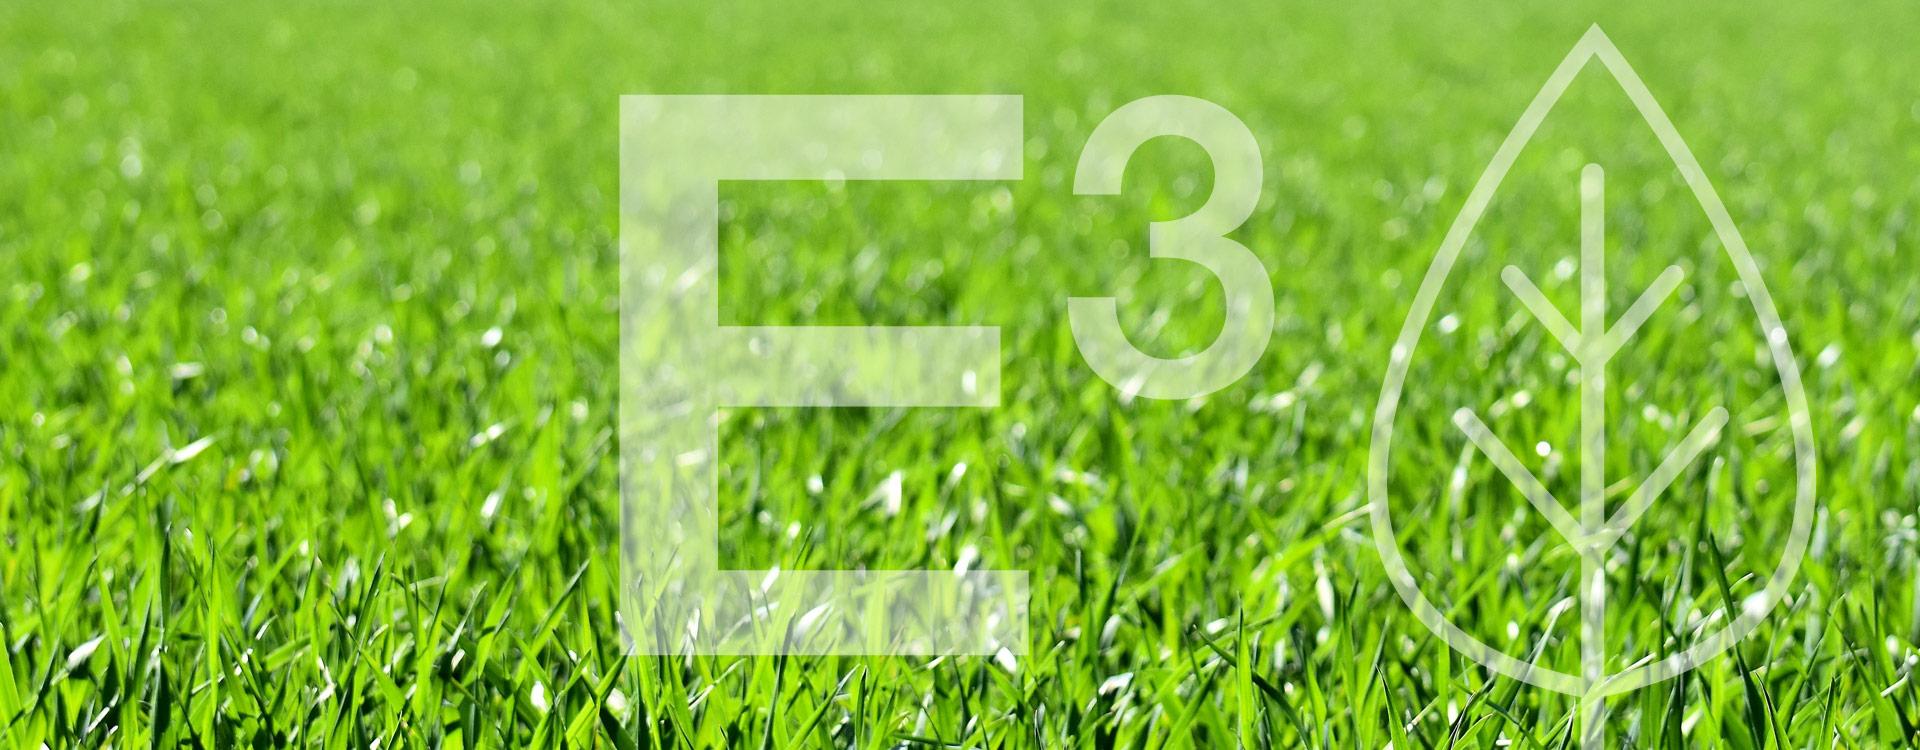 E3 Ebner Energie Effizienz